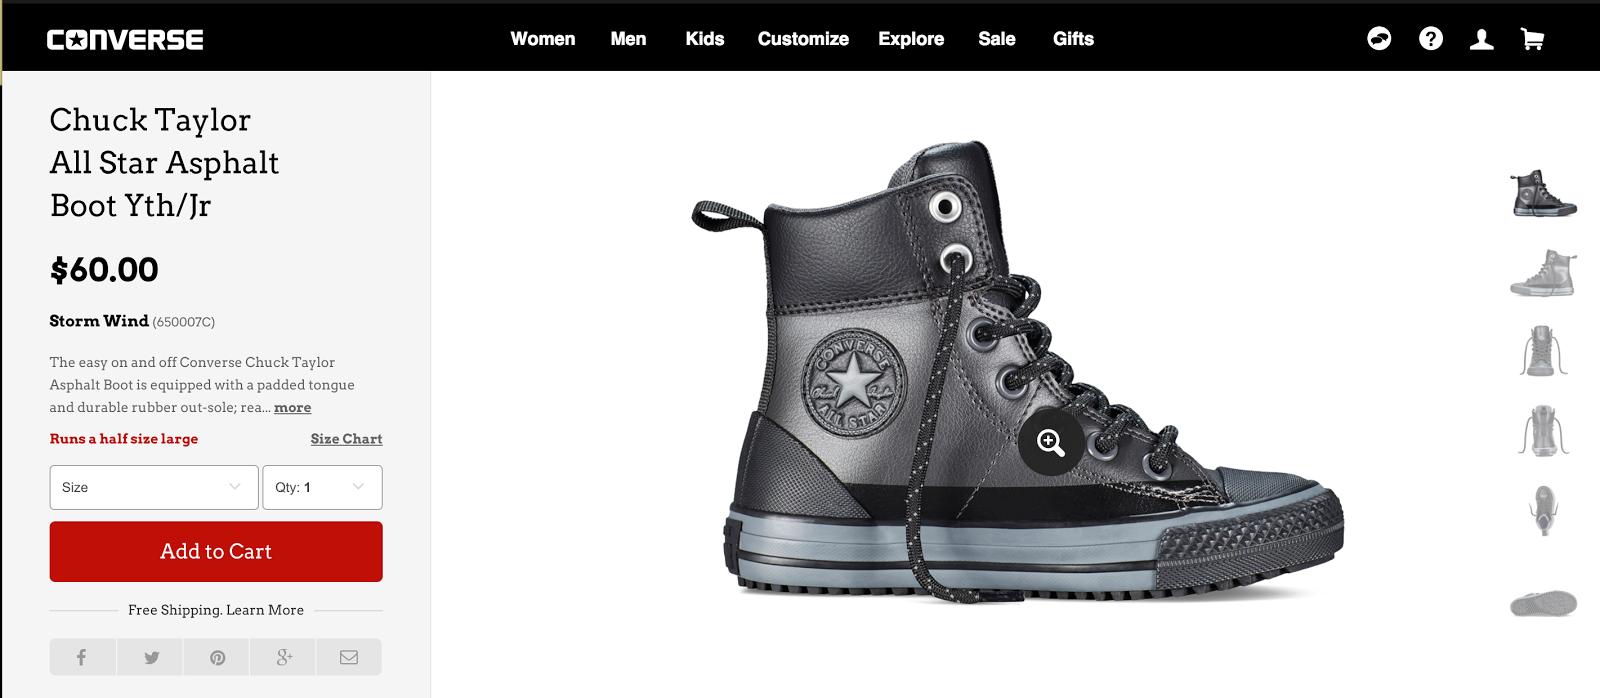 Neueste Converse Pro Leder 76 Ox Ziegel Ziegel Ziegel :